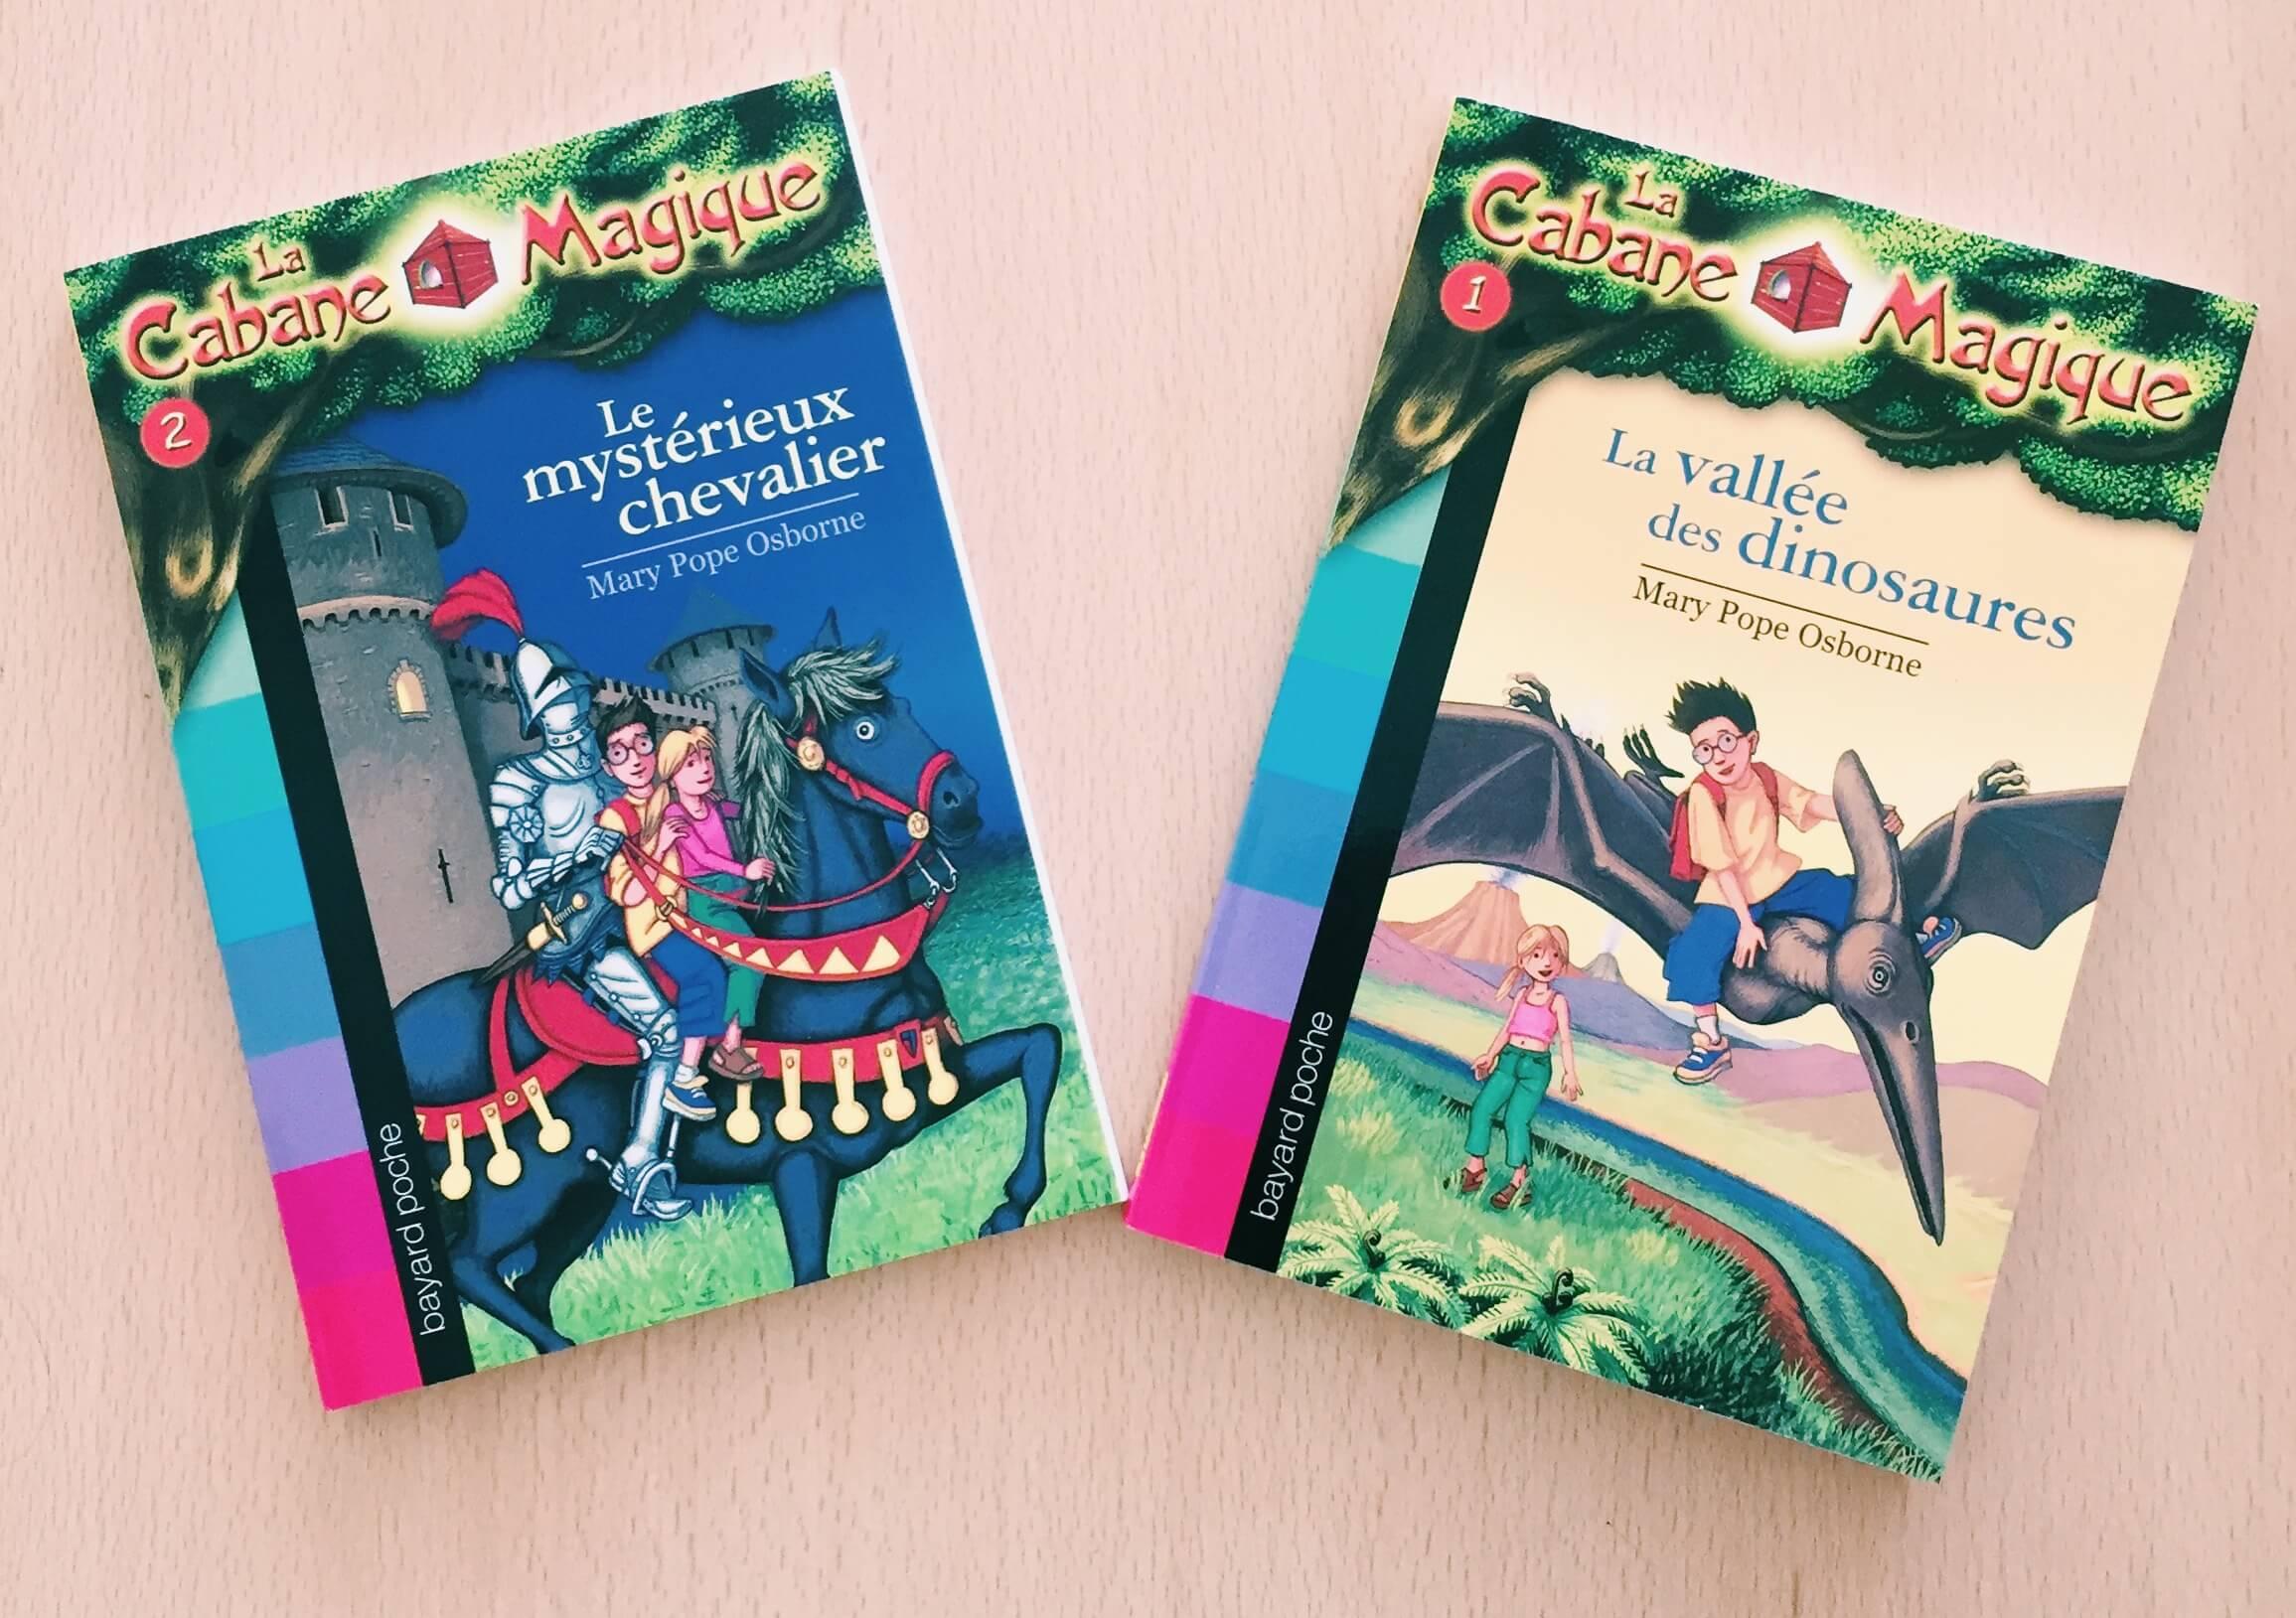 libros lectura fle A2 niños adolescentes